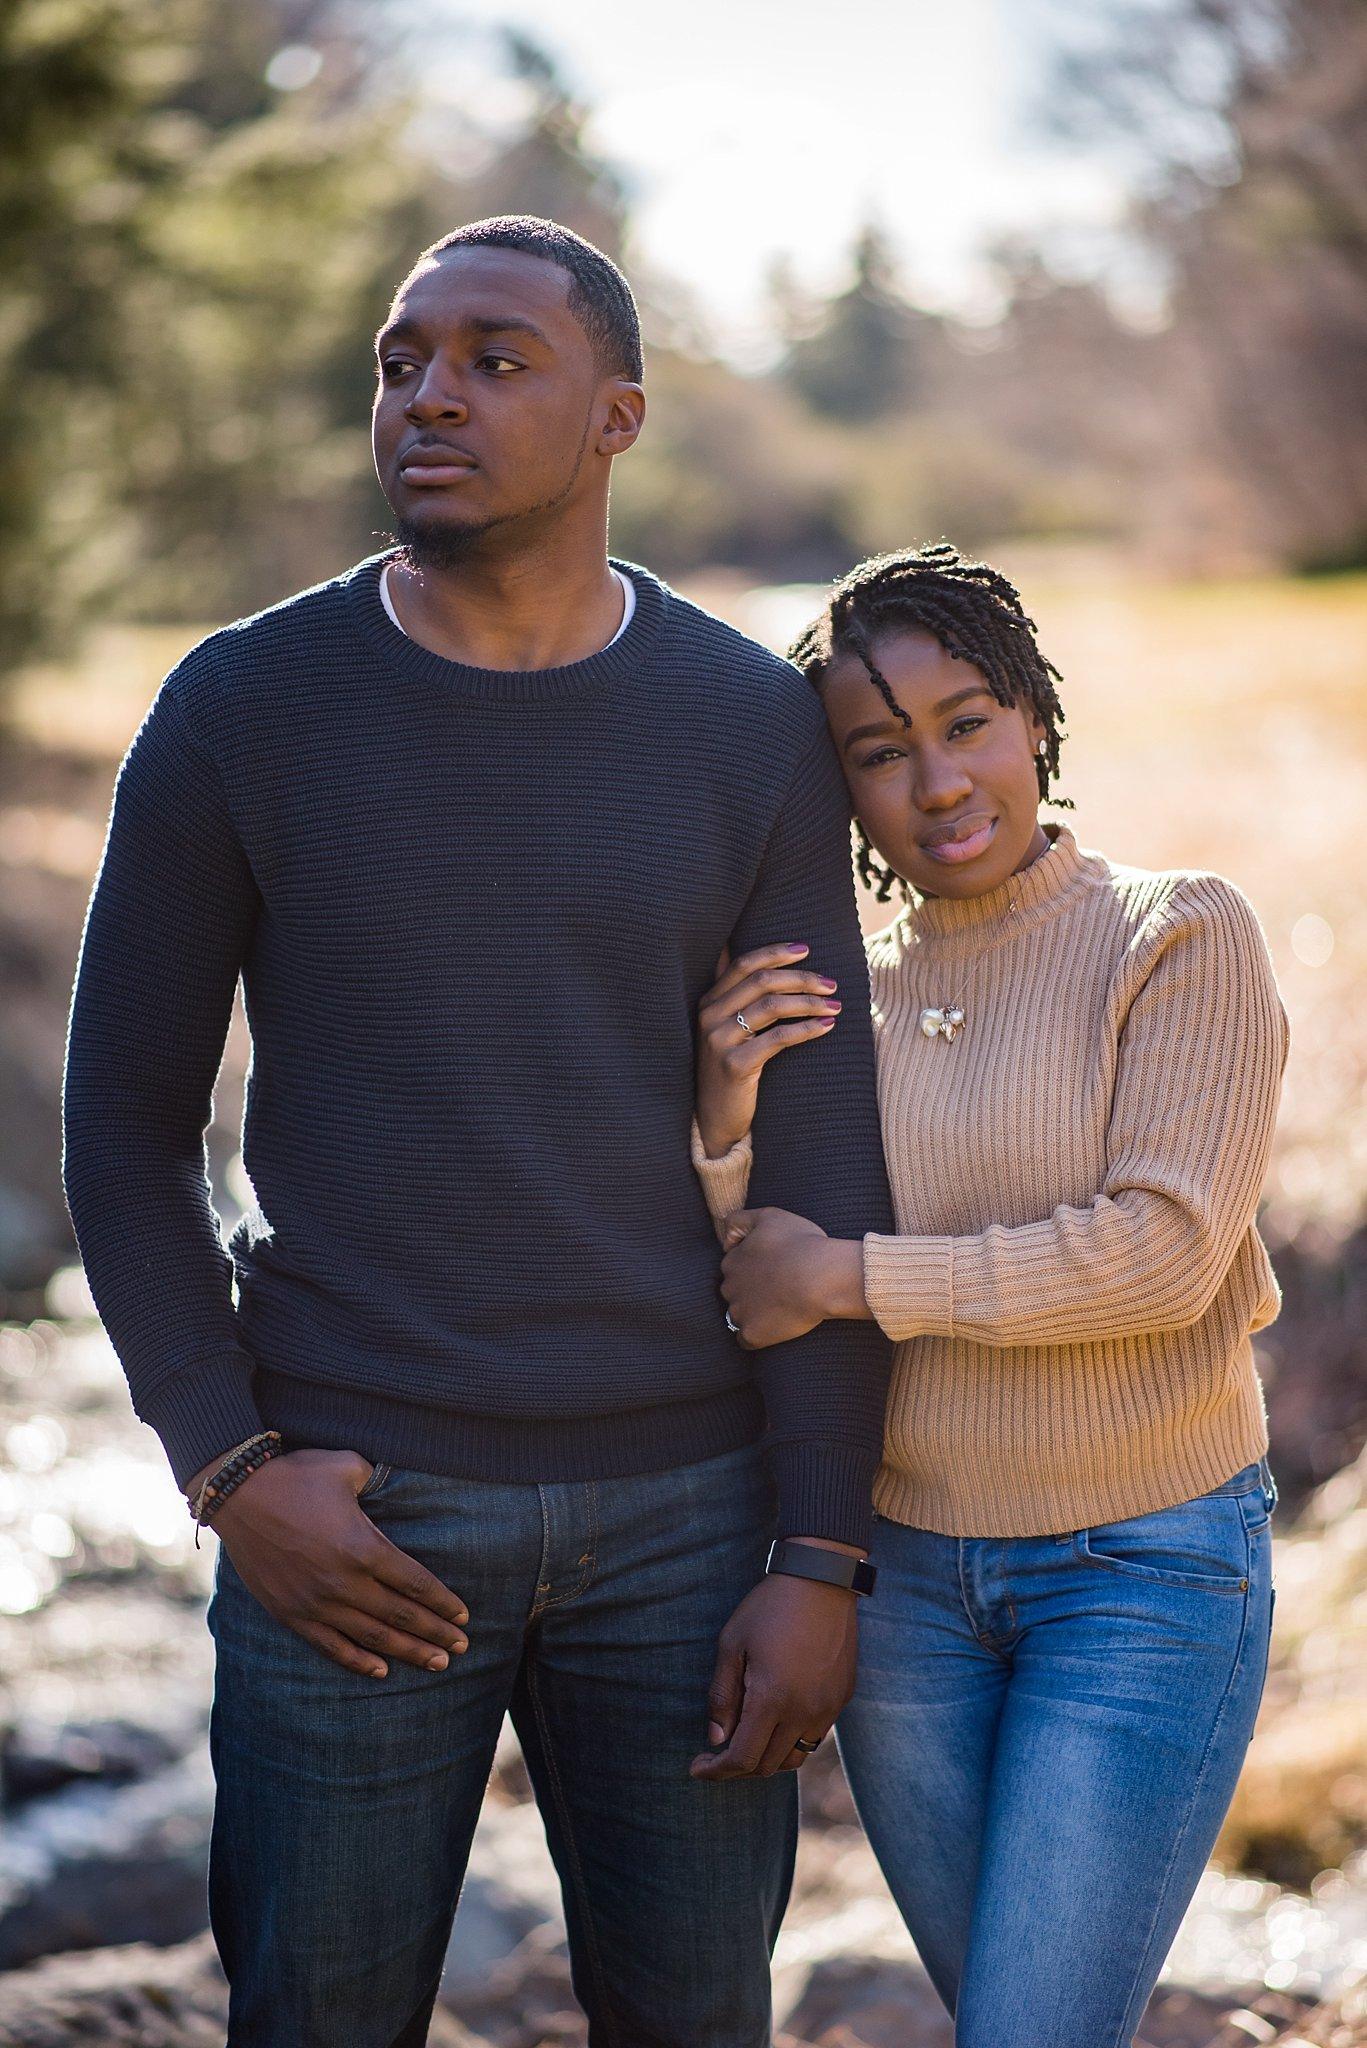 Engagement photographs at the Arnold Arboretum